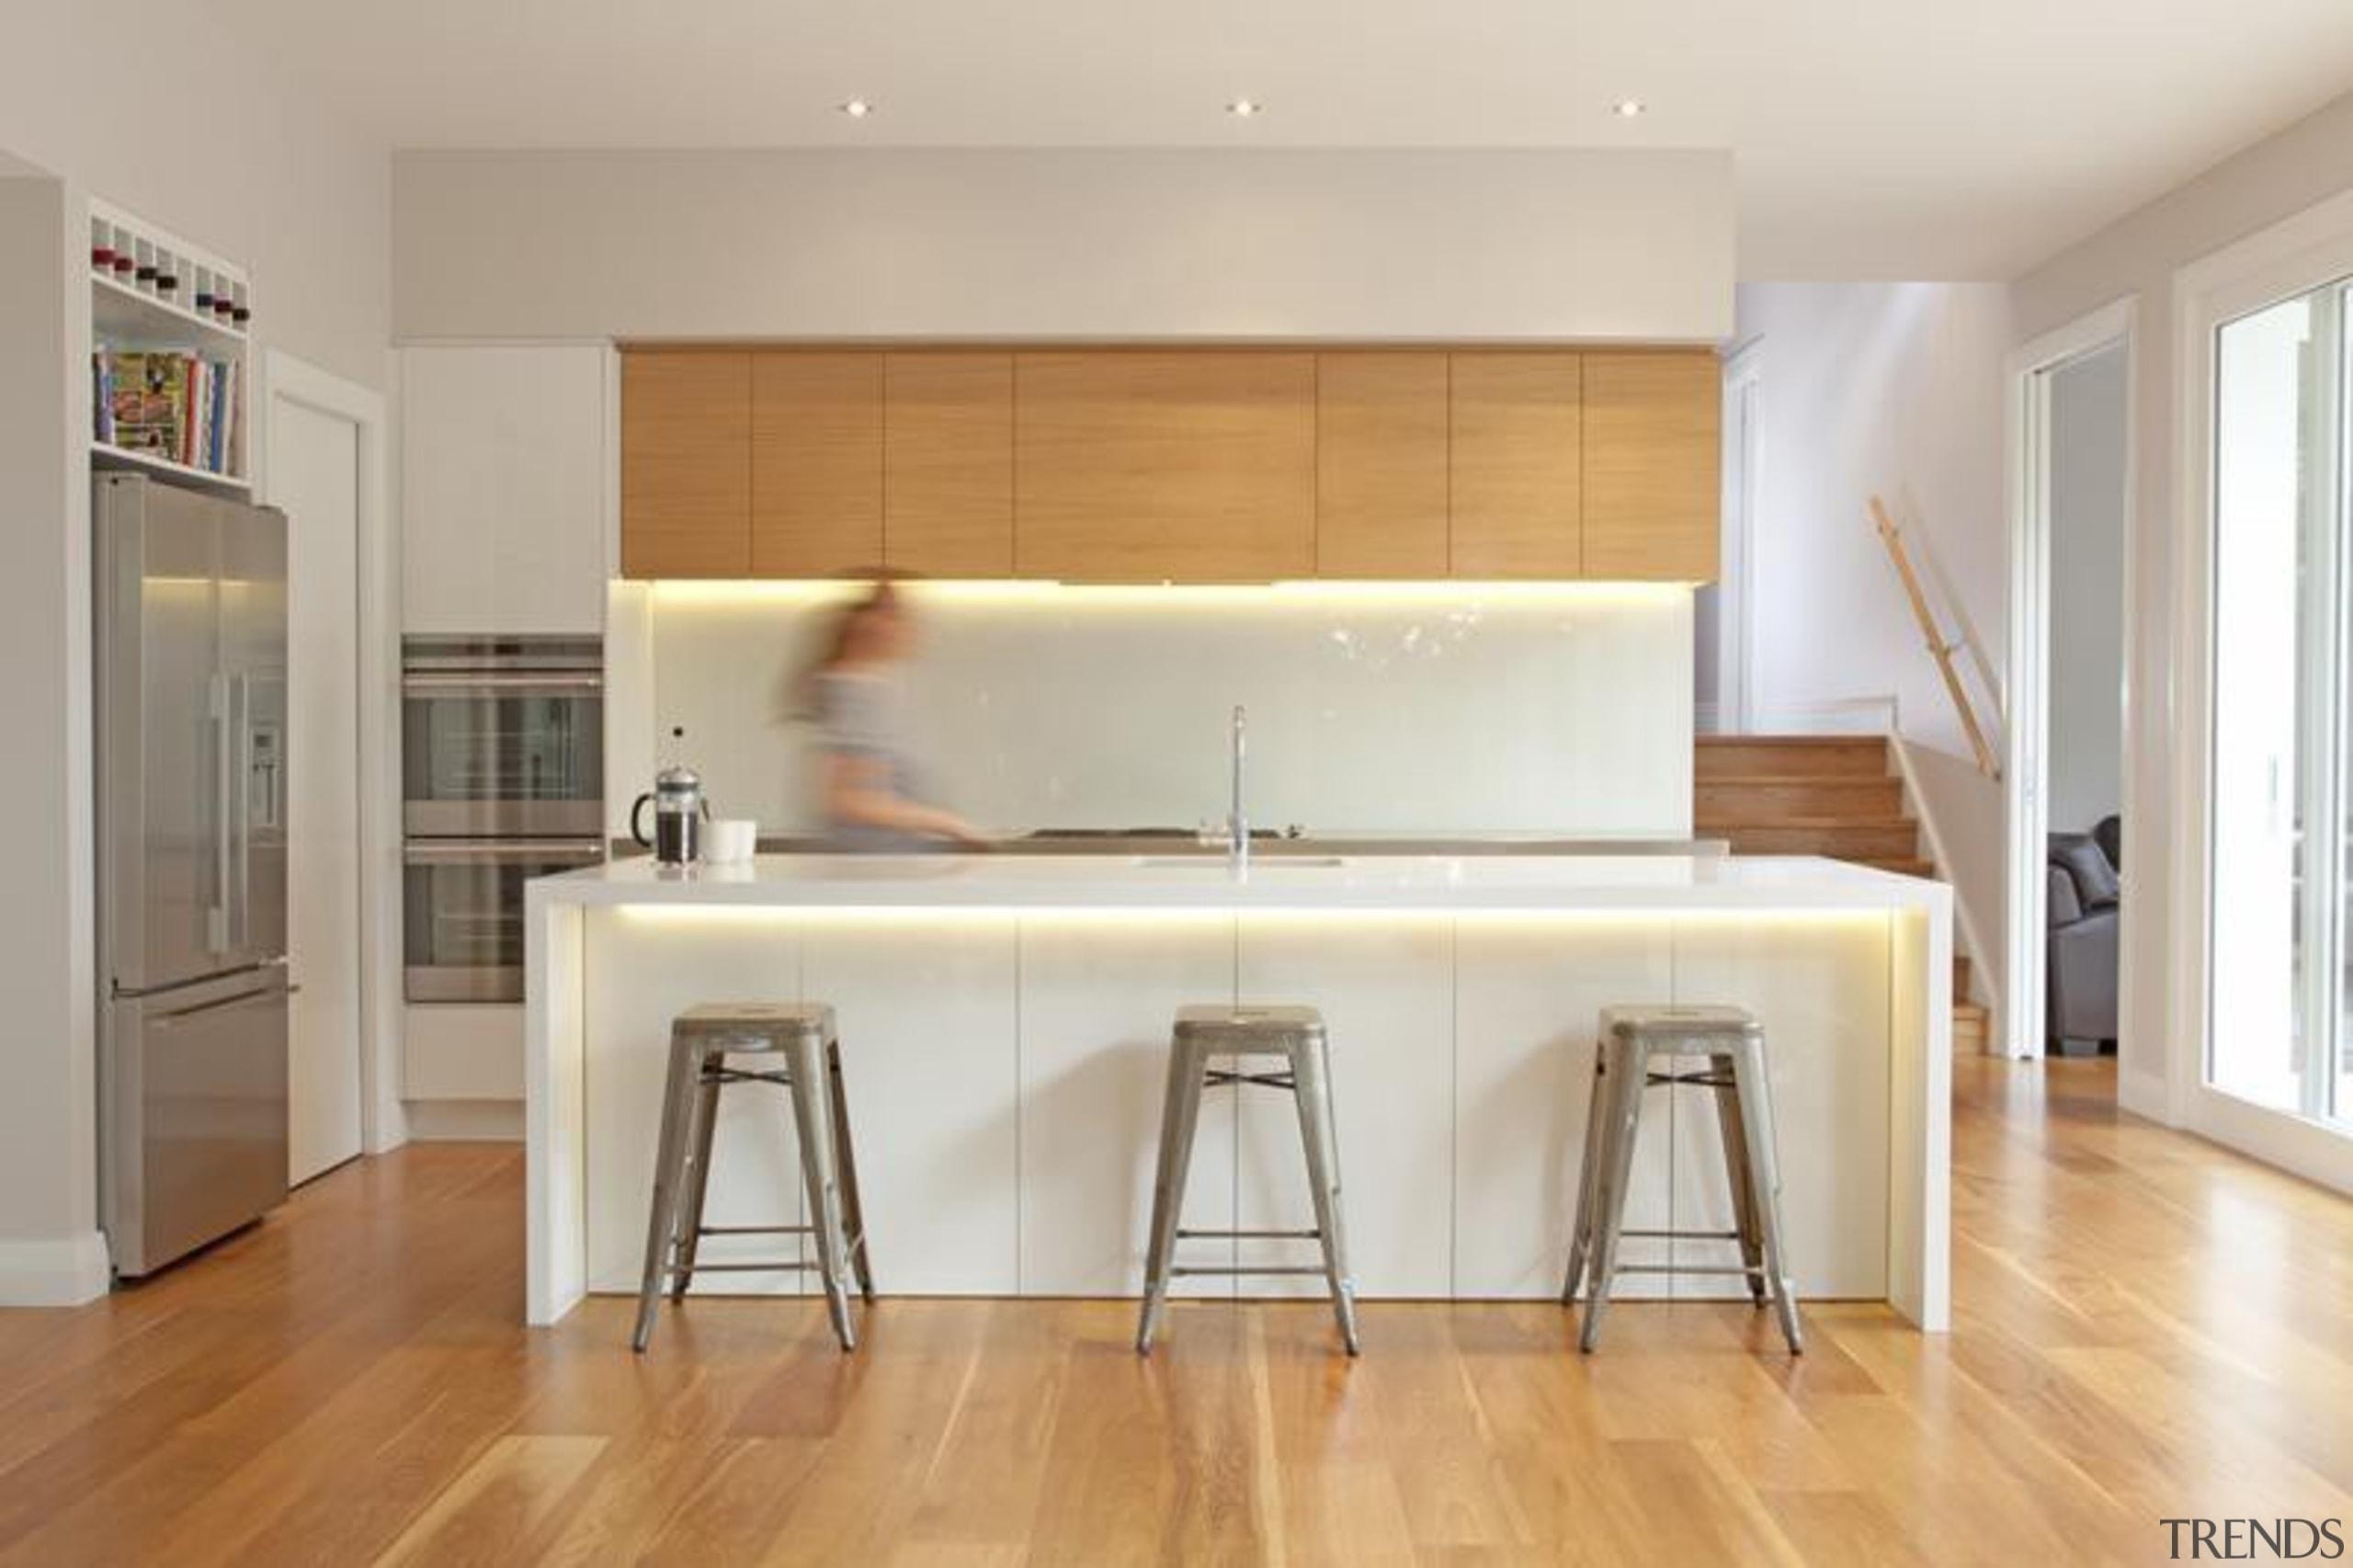 2 pot lacquer and American white oak veneer countertop, floor, flooring, hardwood, interior design, kitchen, laminate flooring, real estate, room, wall, wood, wood flooring, gray